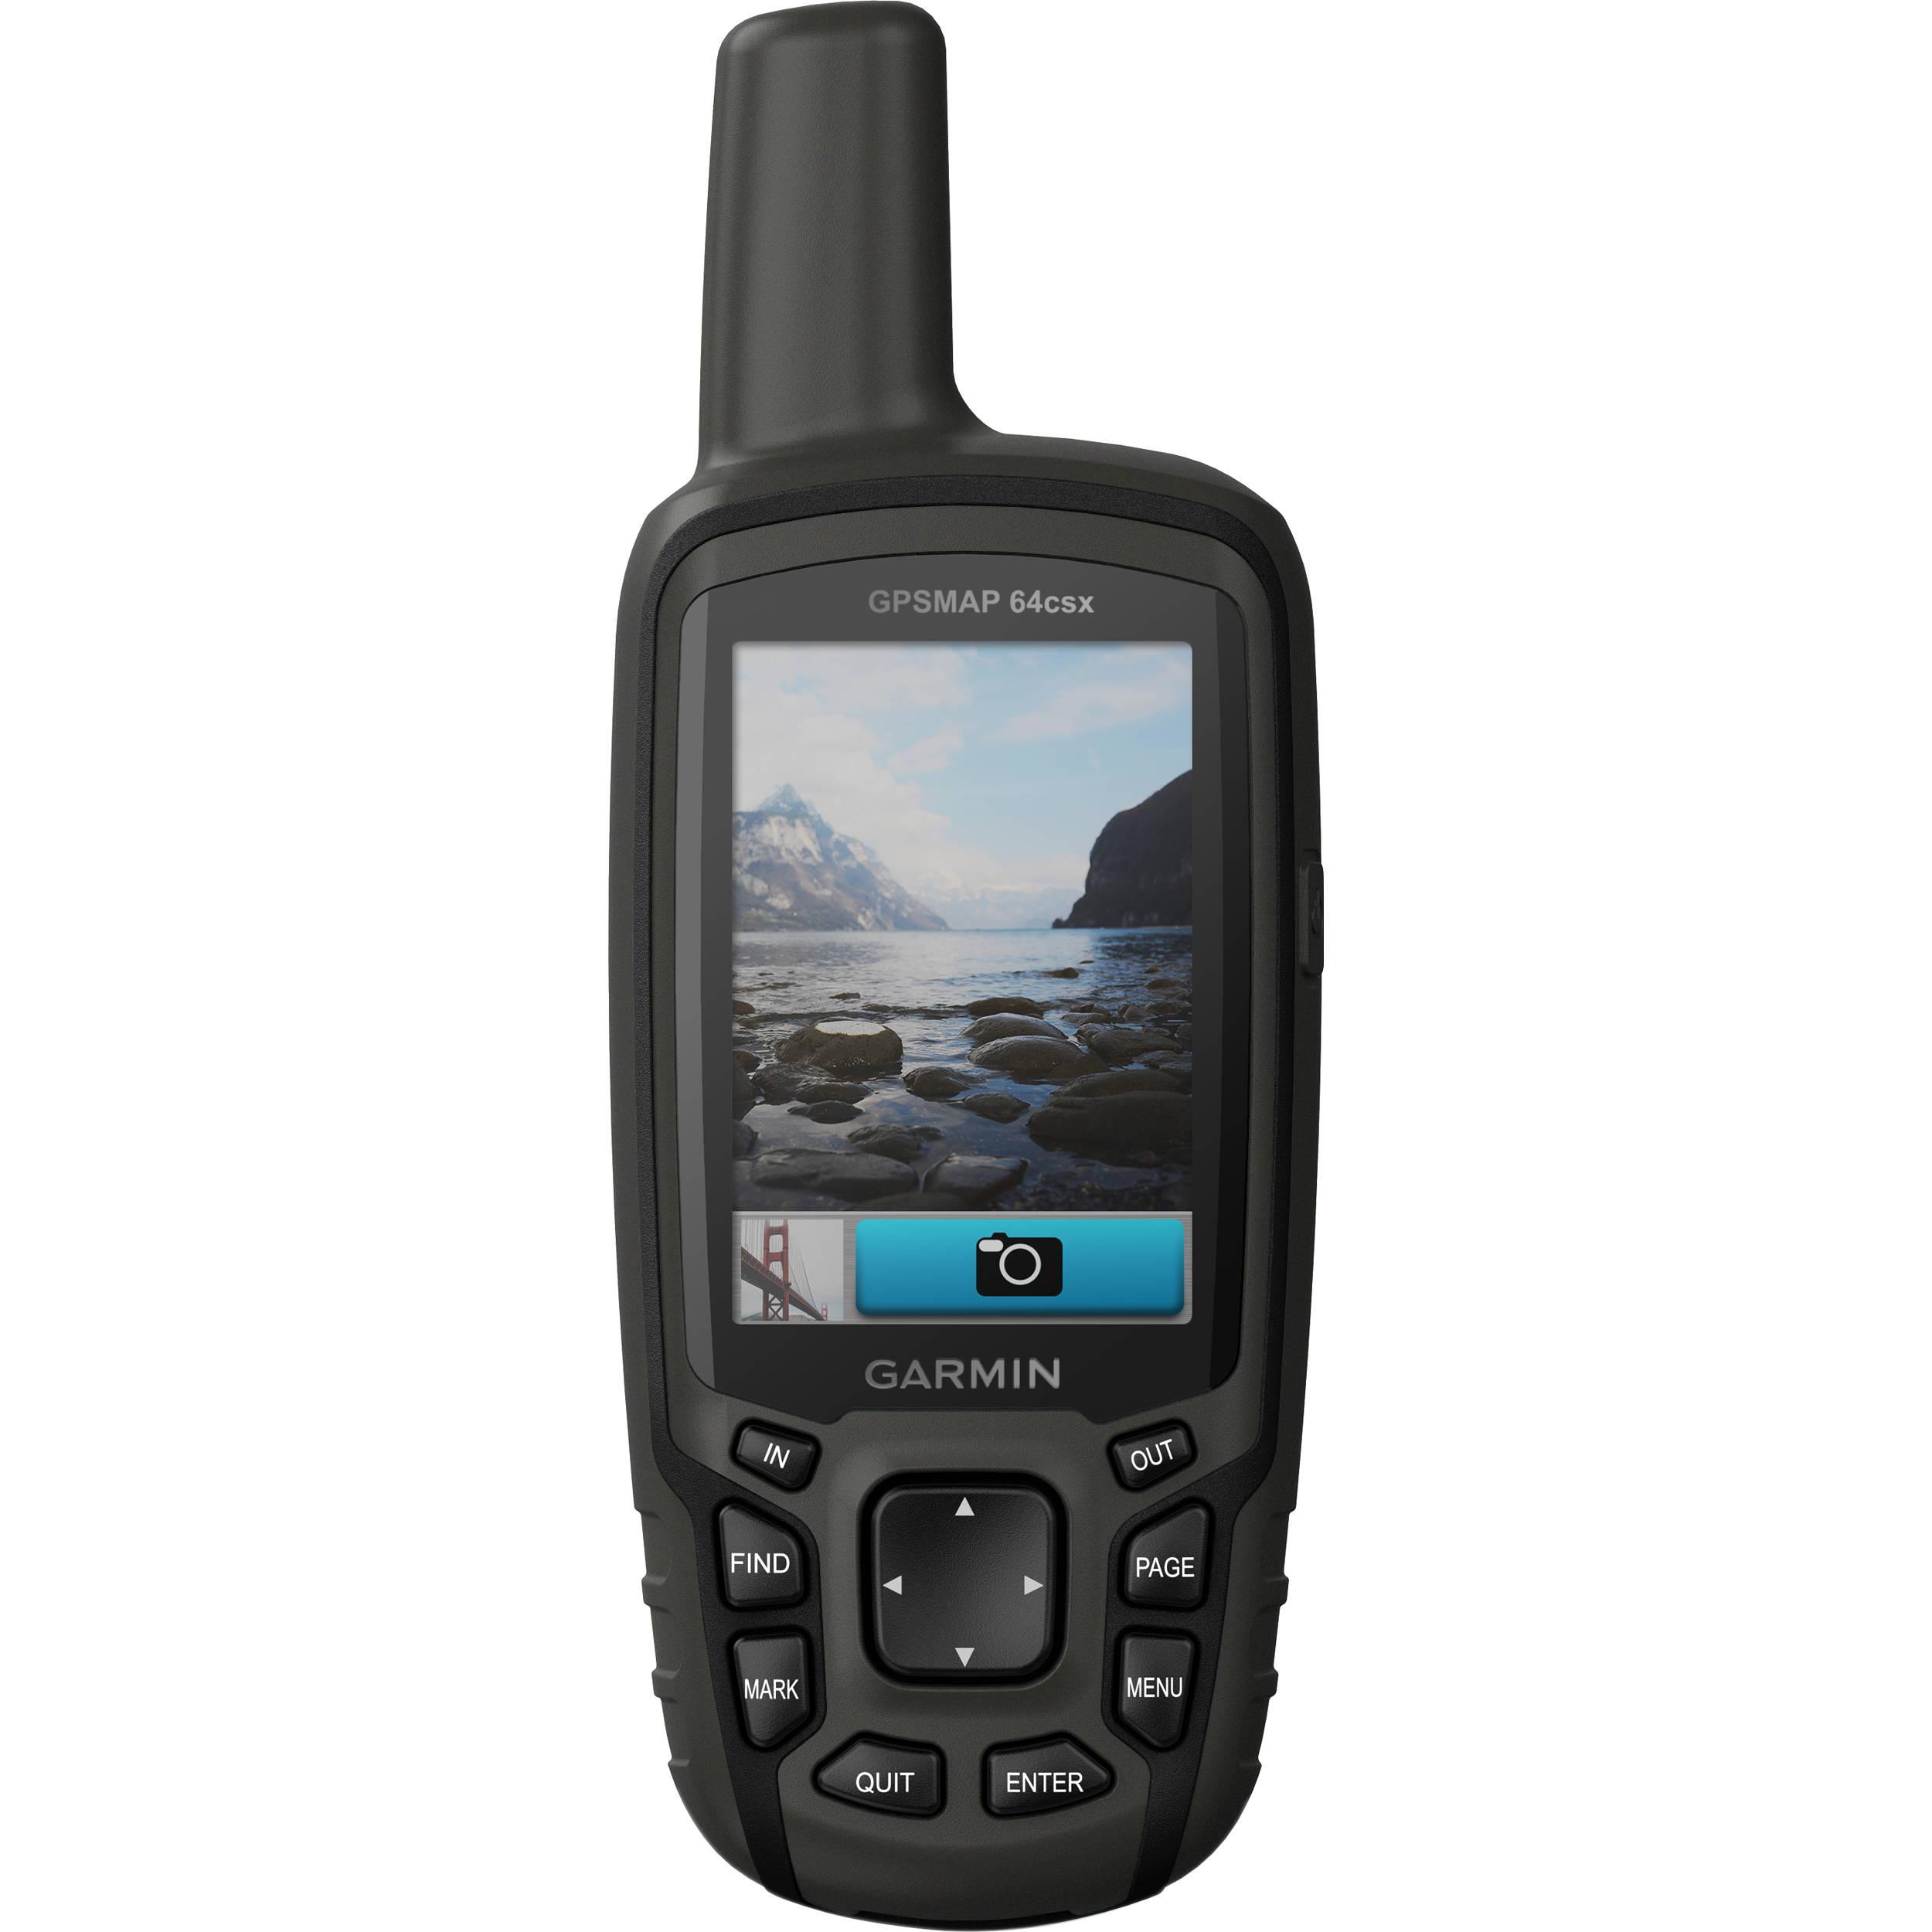 Garmin 64x GPSMAP Navigator on montana gps hunting maps, garmin etrex 20 topo maps, garmin montana 650t gps maps, colorado gmu topo maps, android gps topo maps,